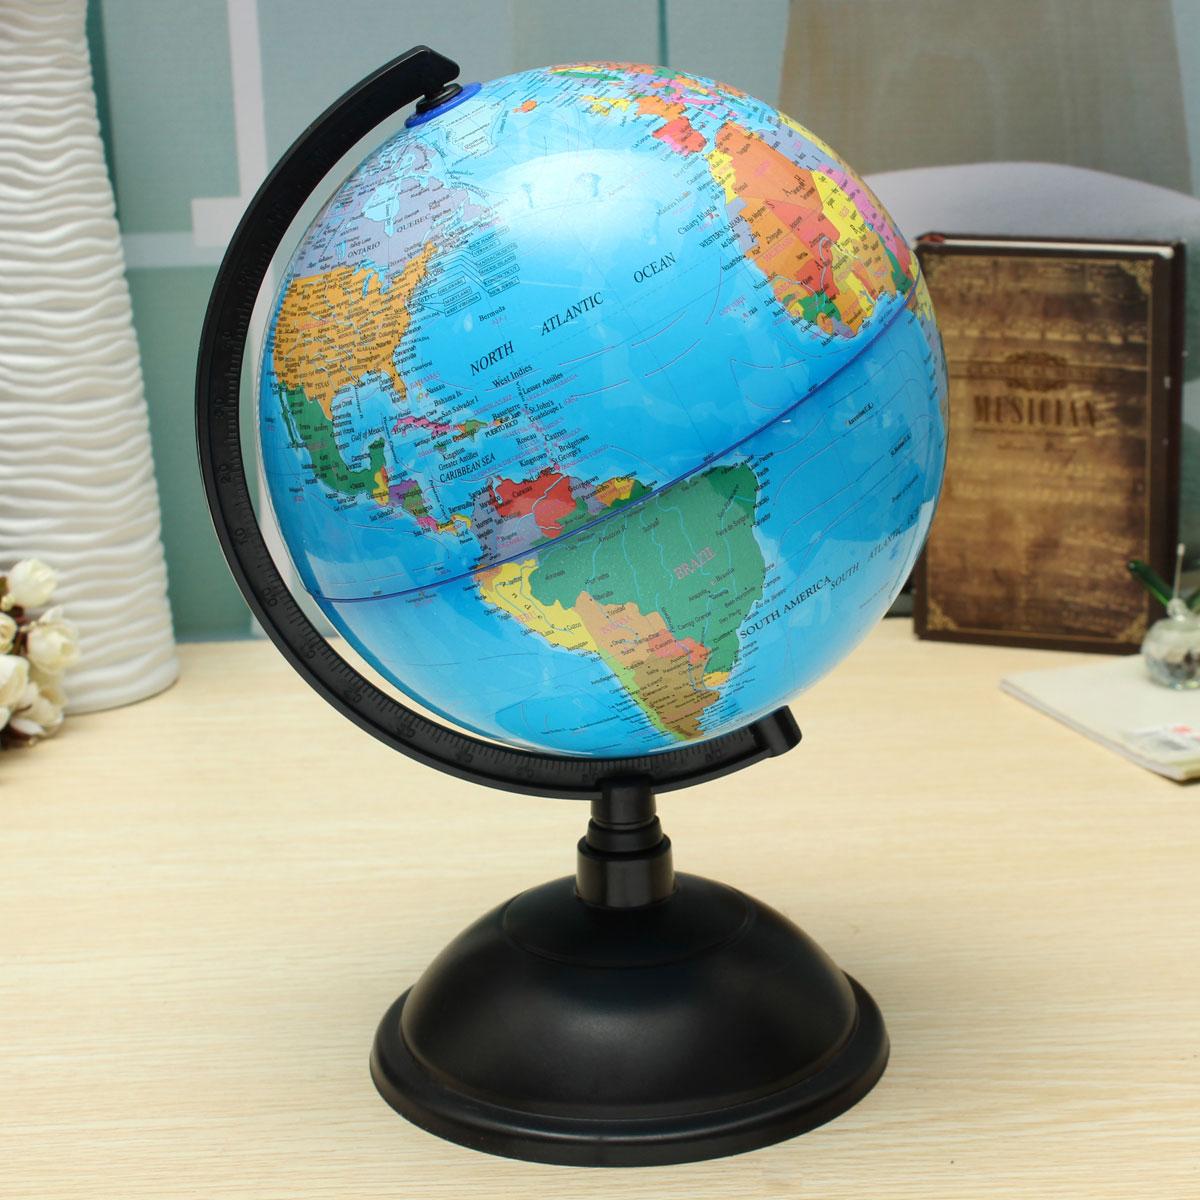 20cm World Map Foam Ball Atlas Globe English Ball Planet Earth Ball Toys for Kids Girls boys Geography Educational Supplies